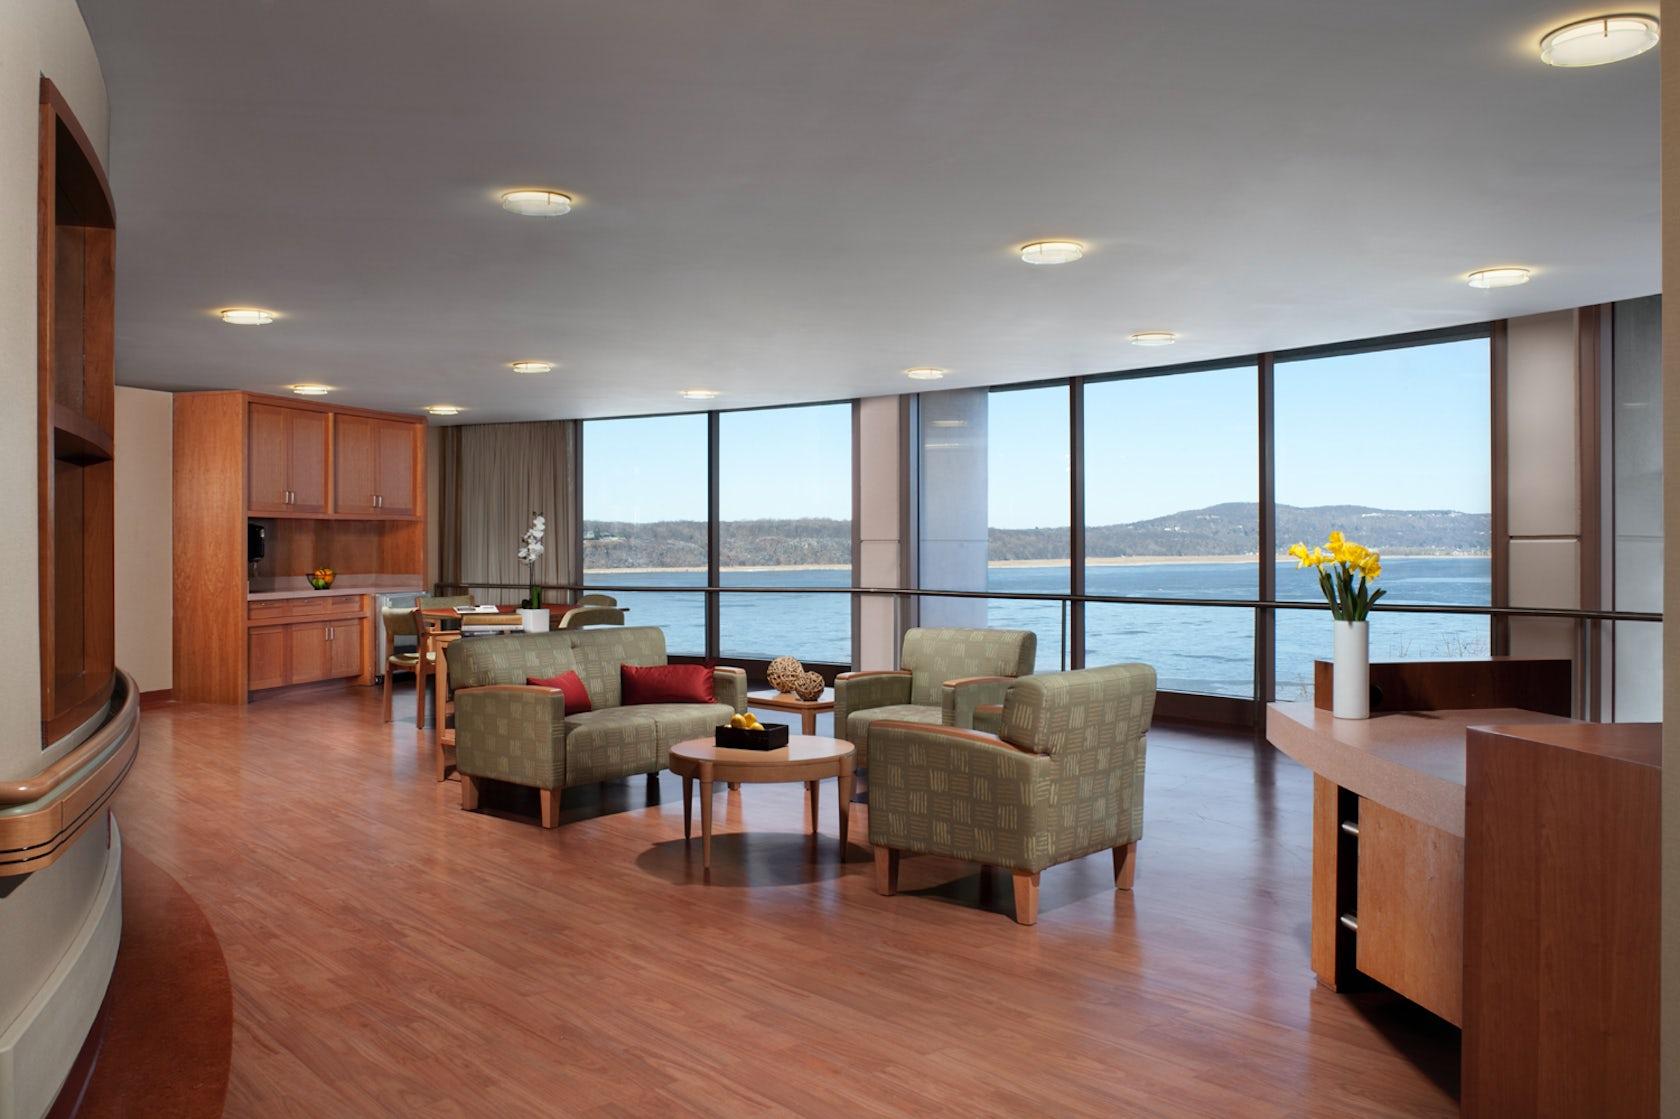 Cabrini of westchester nursing home architizer for Interior decorator westchester ny